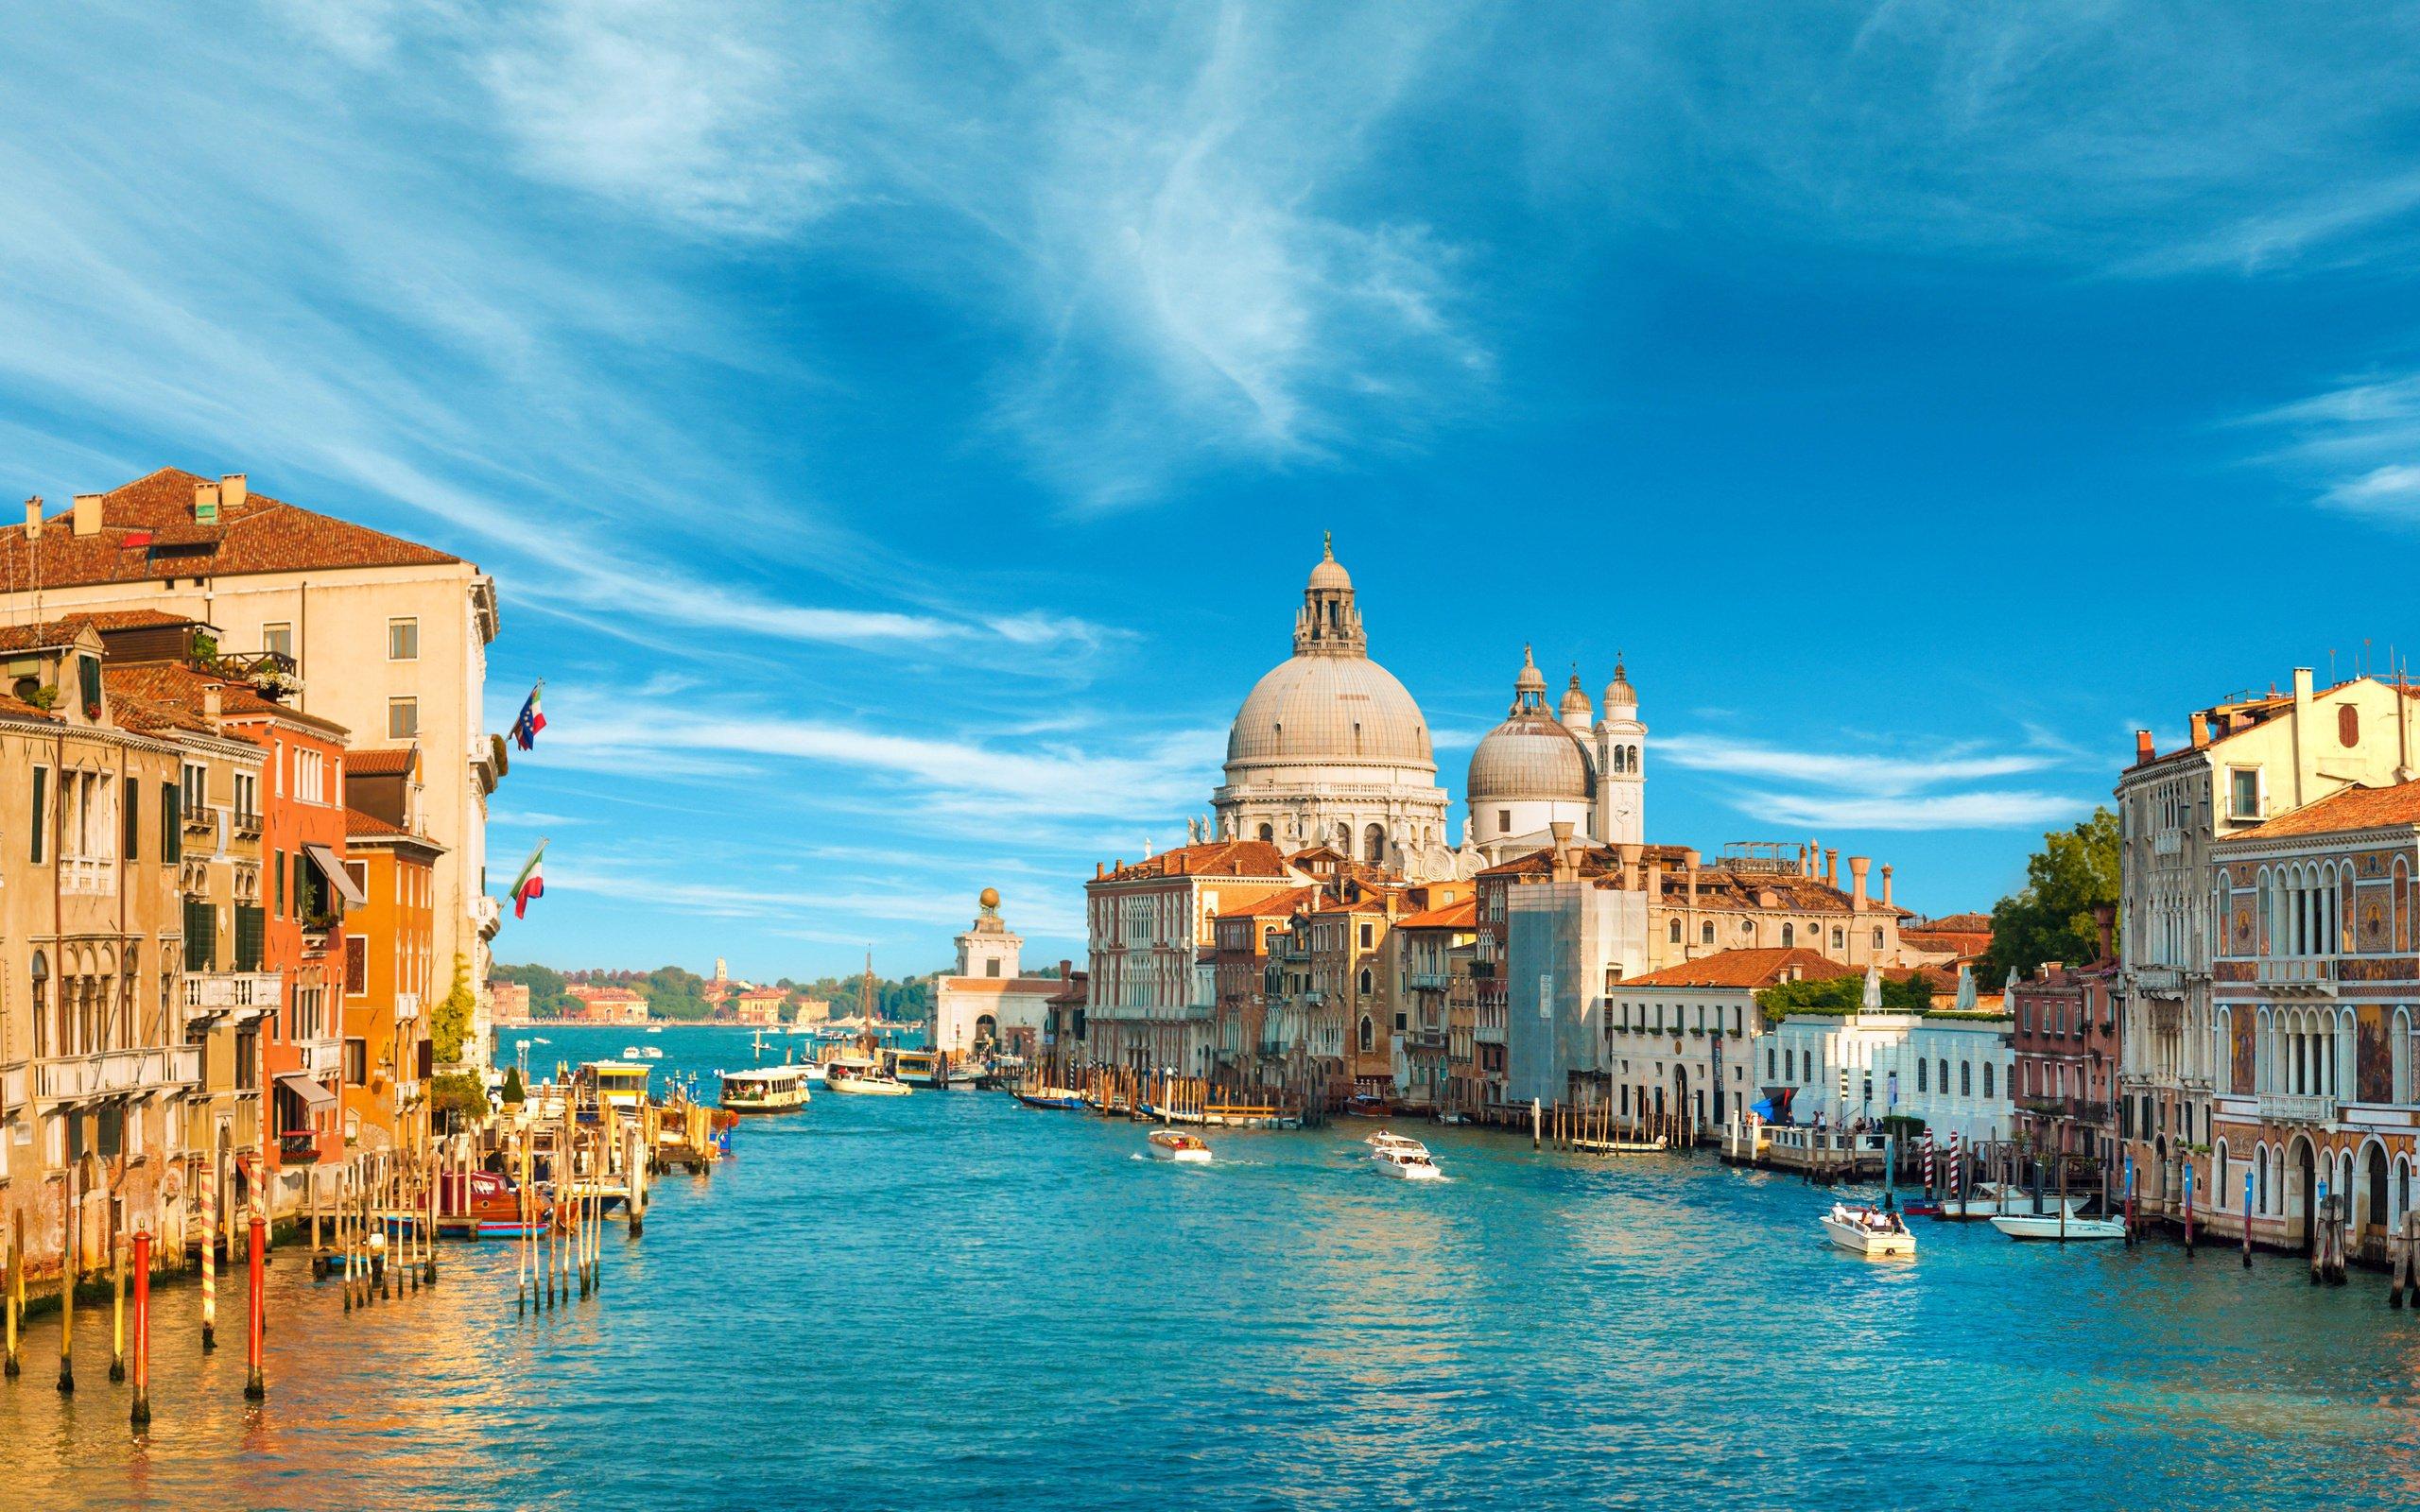 Venice italy venezia wallpaper 2560x1600 247342 WallpaperUP 2560x1600